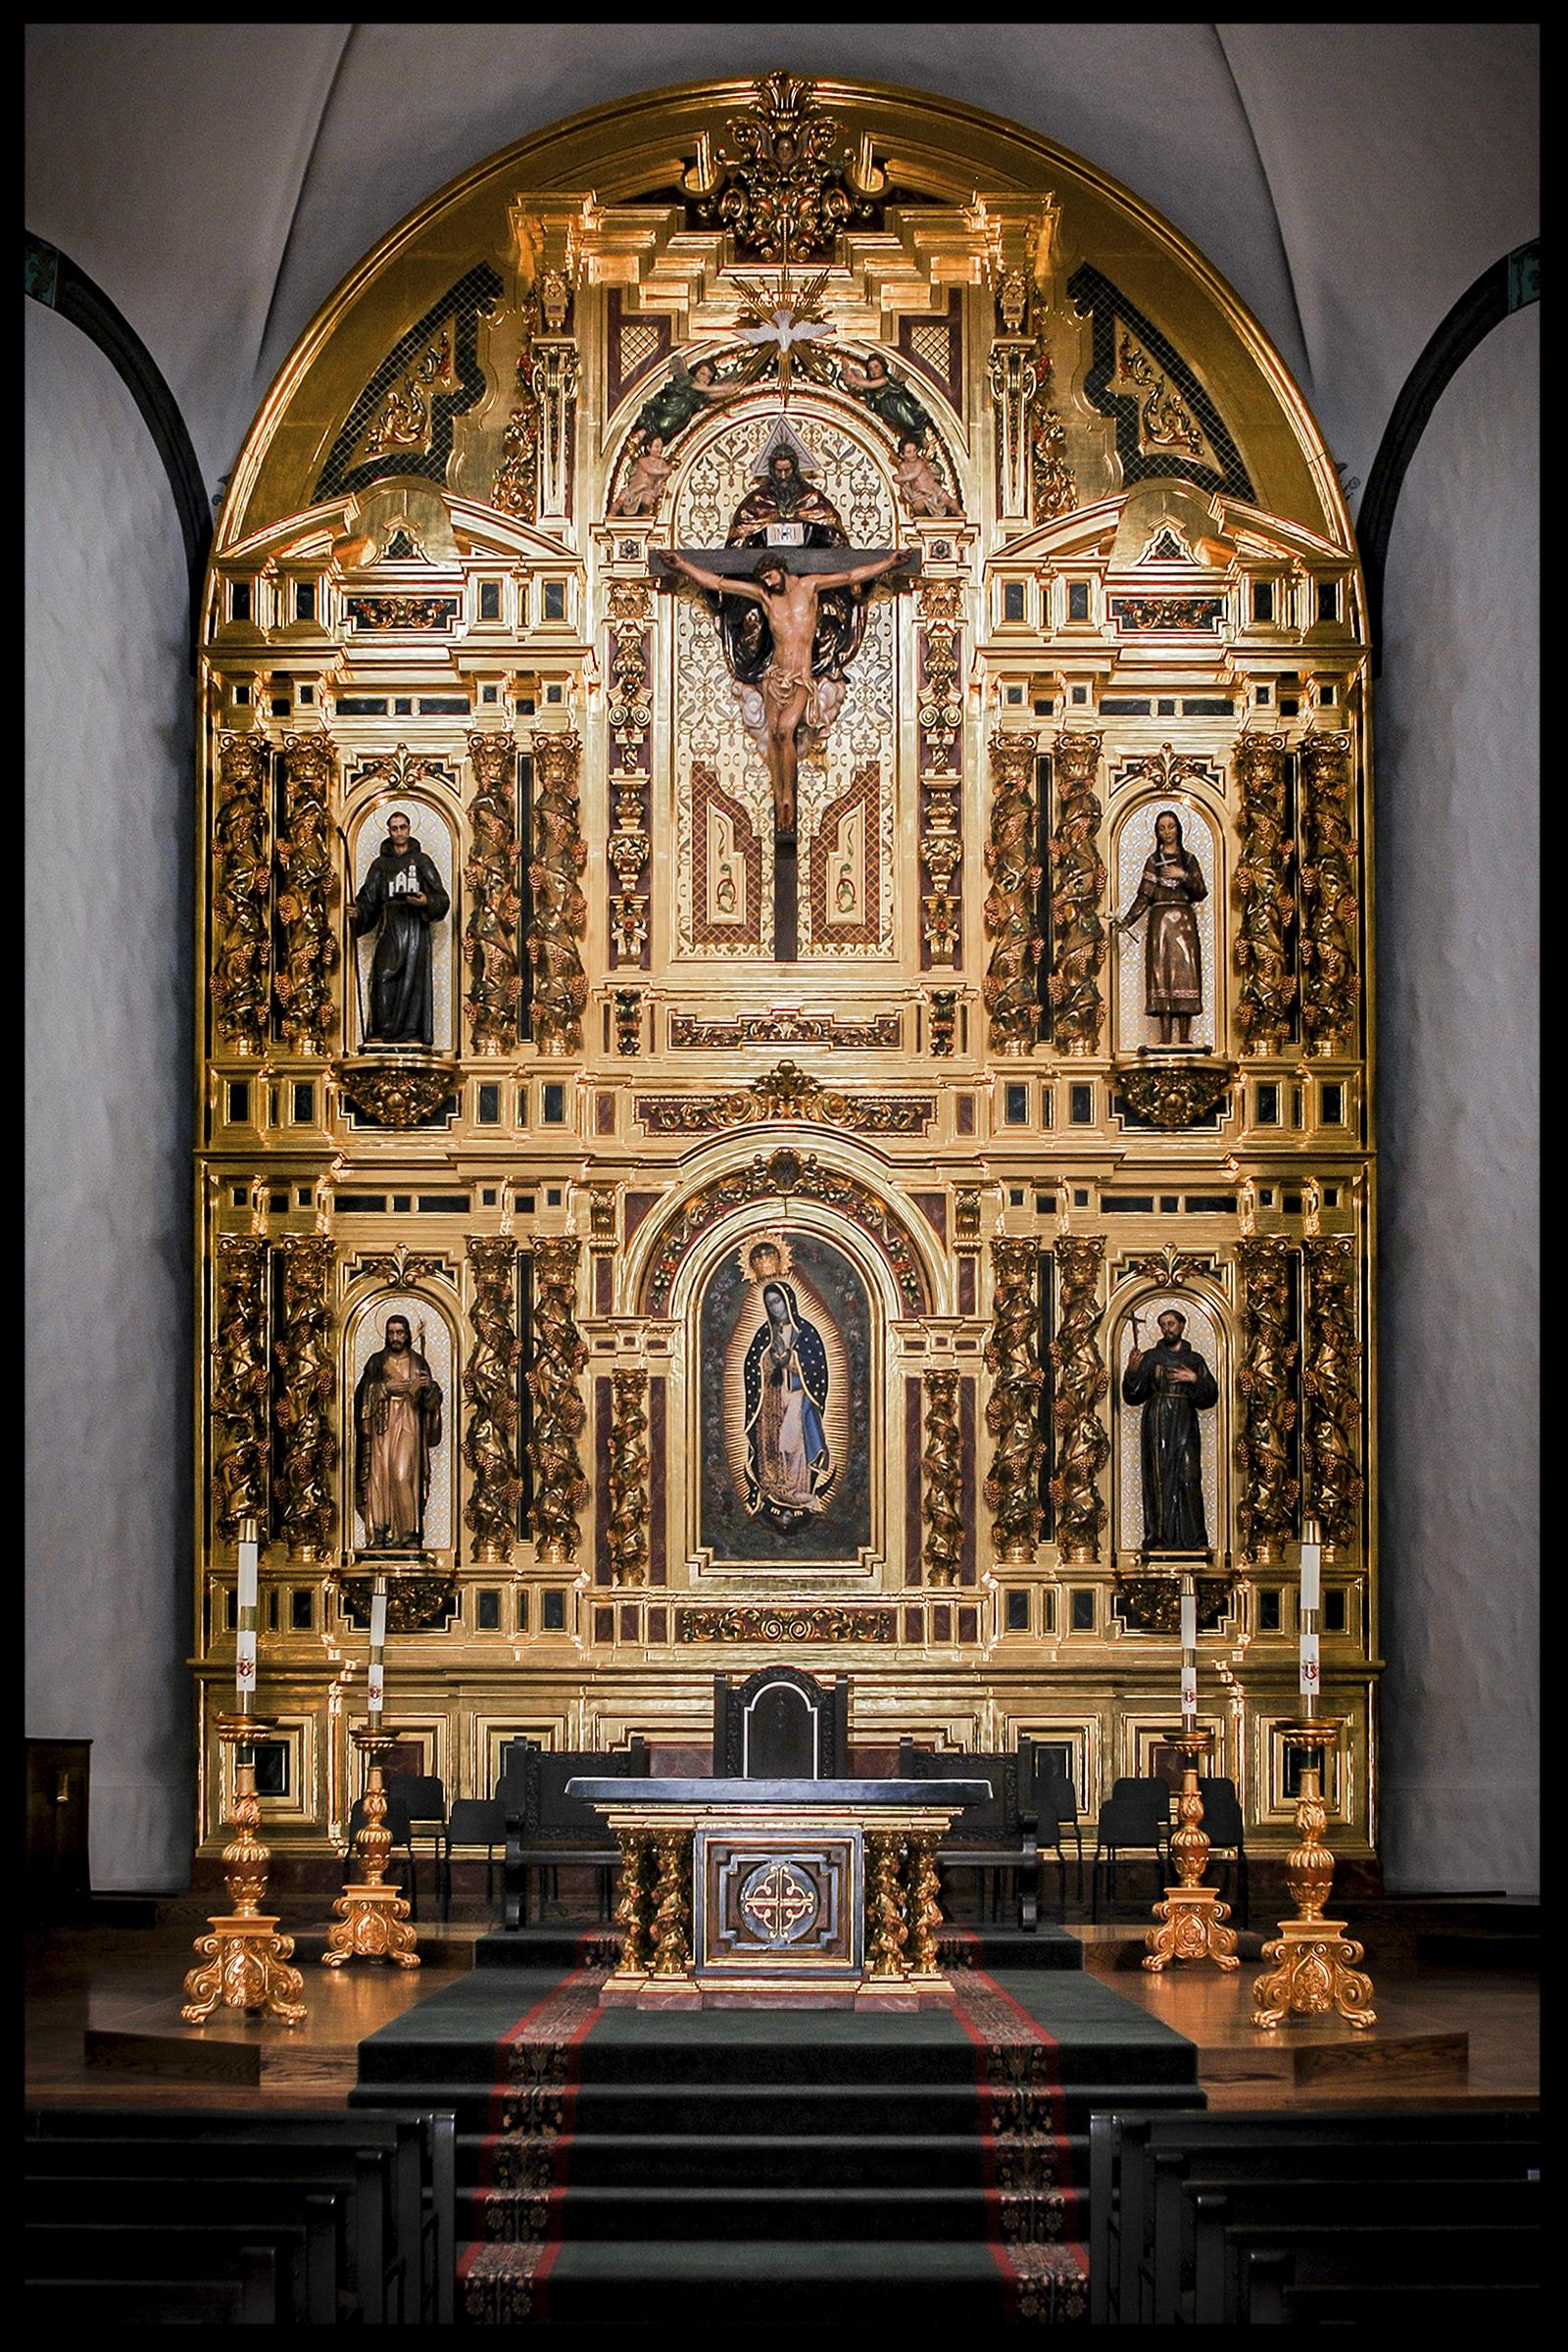 Mission Basilica San Juan Capistrano's Grand Retablo. Photography by Roderick Fenn ©2009